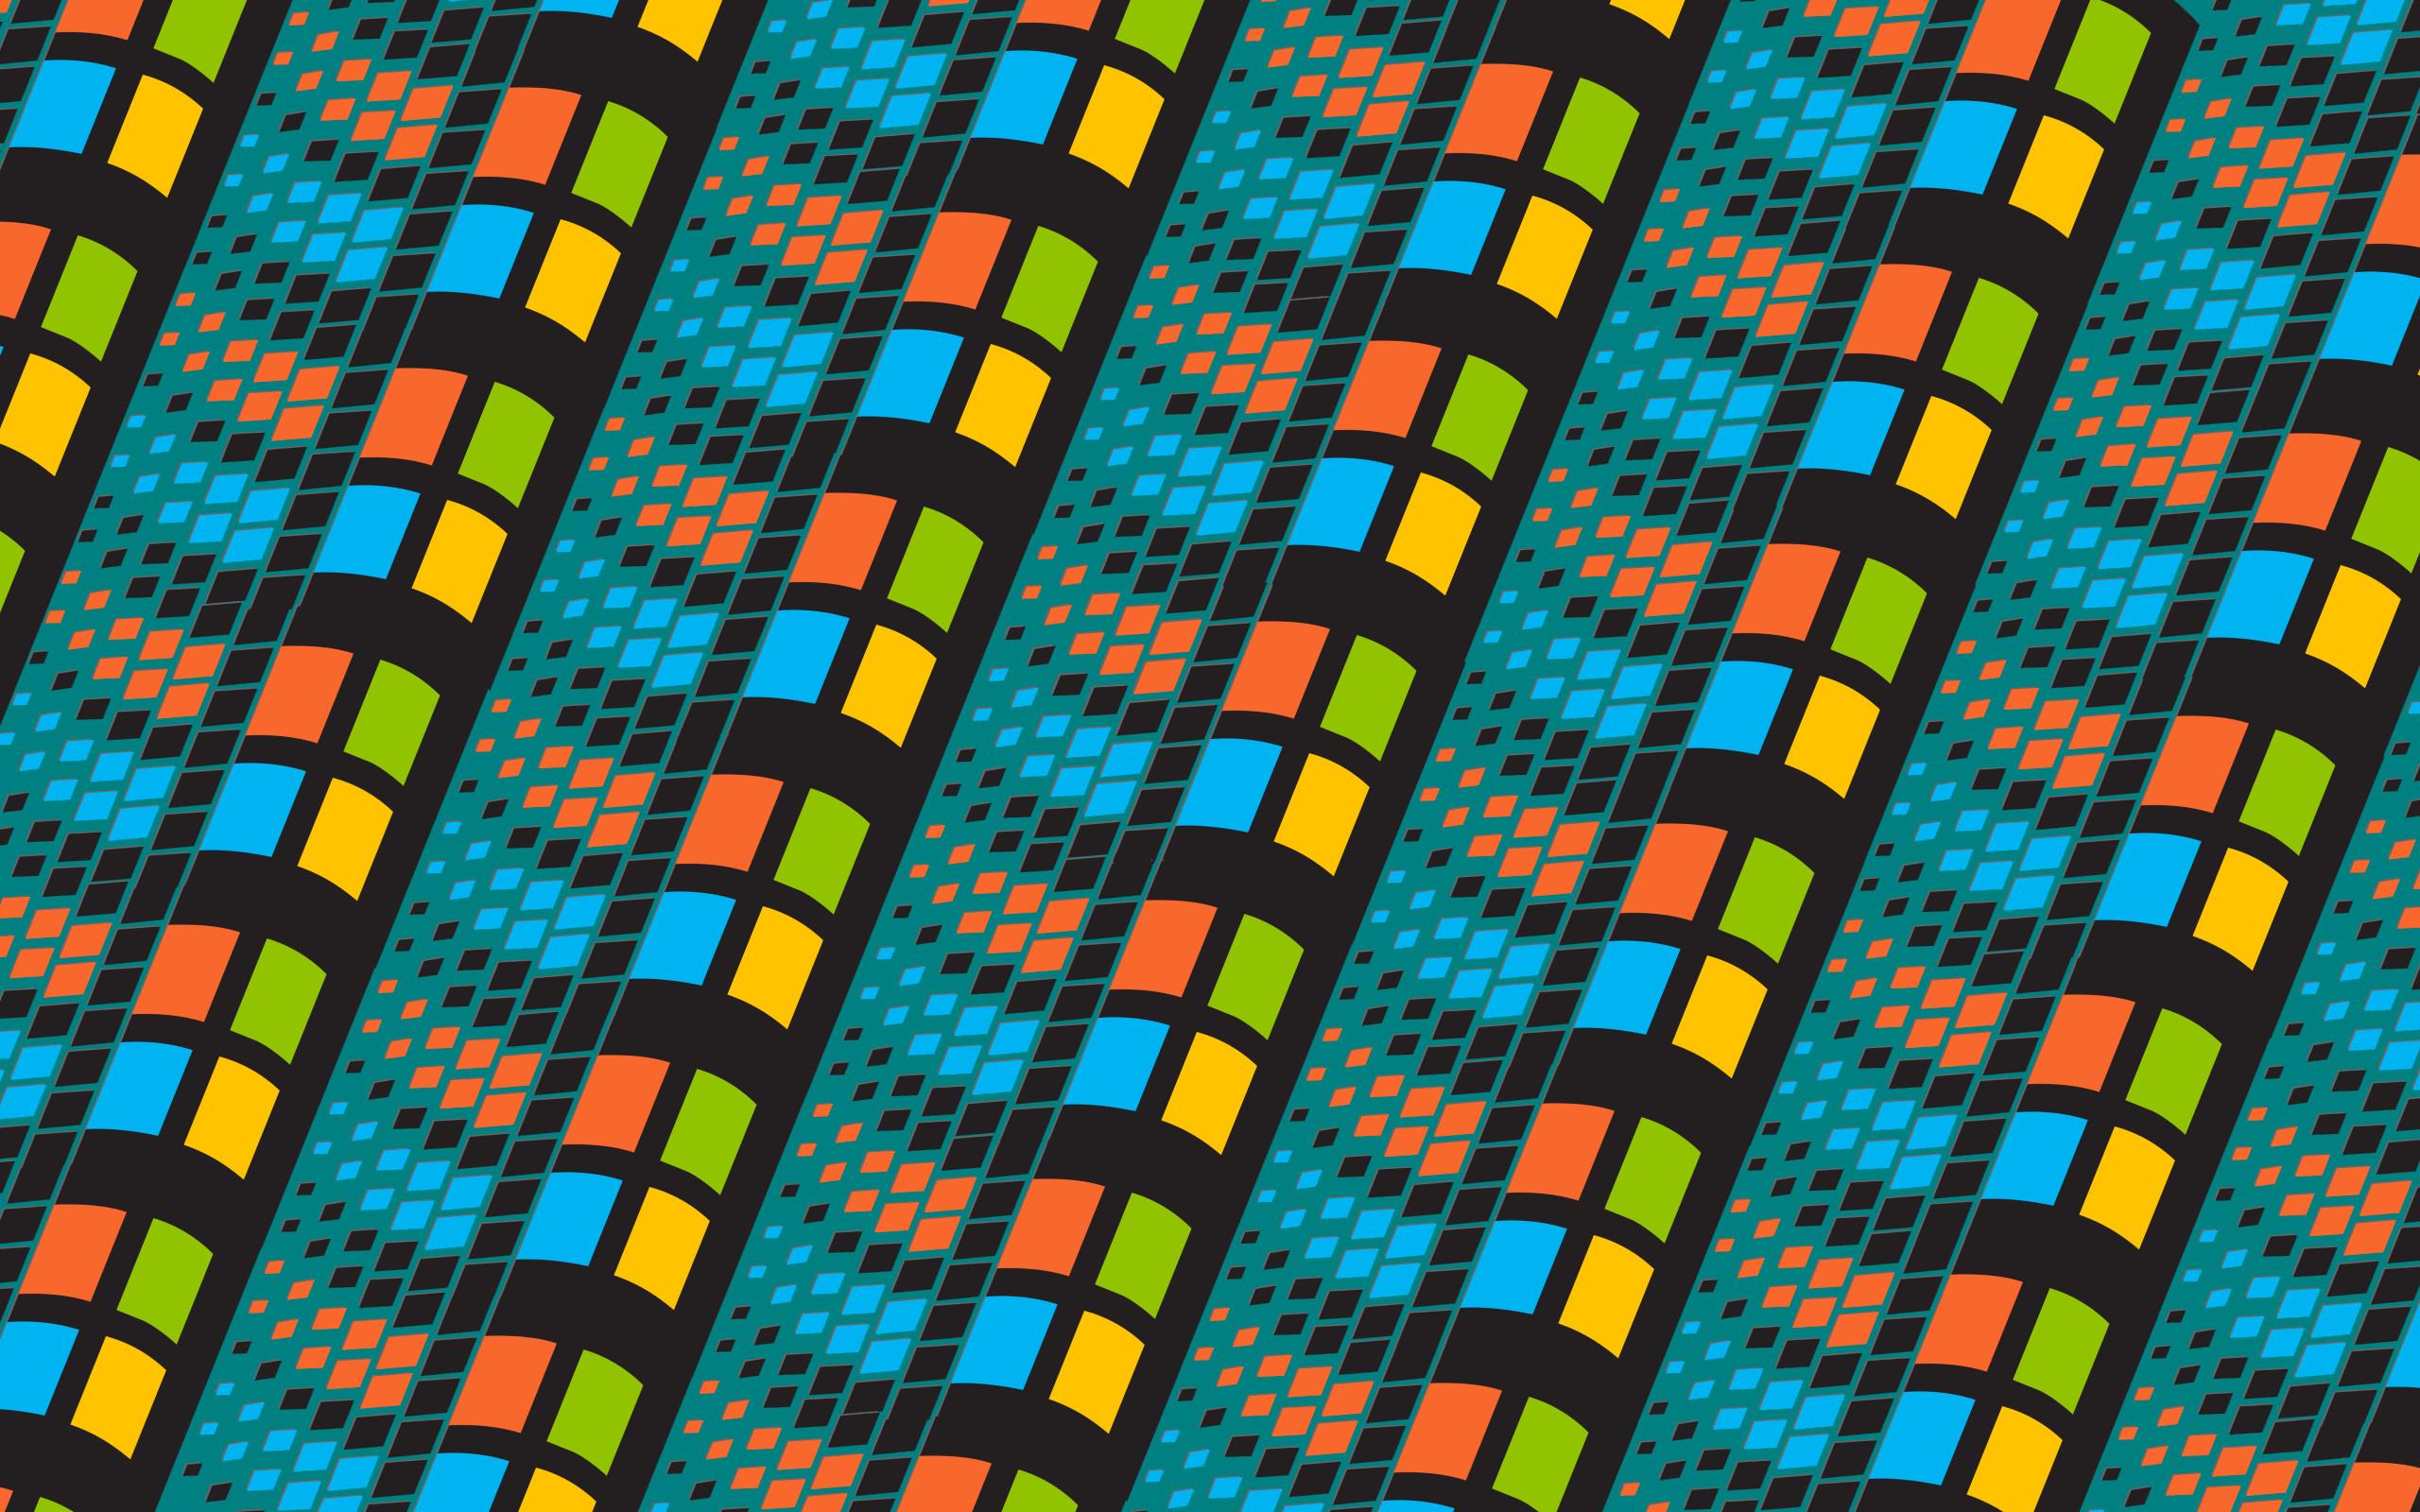 Res: 2560x1600, This windows 95' aesthetic wallpaper i spent too long making []  (i.redd.it)